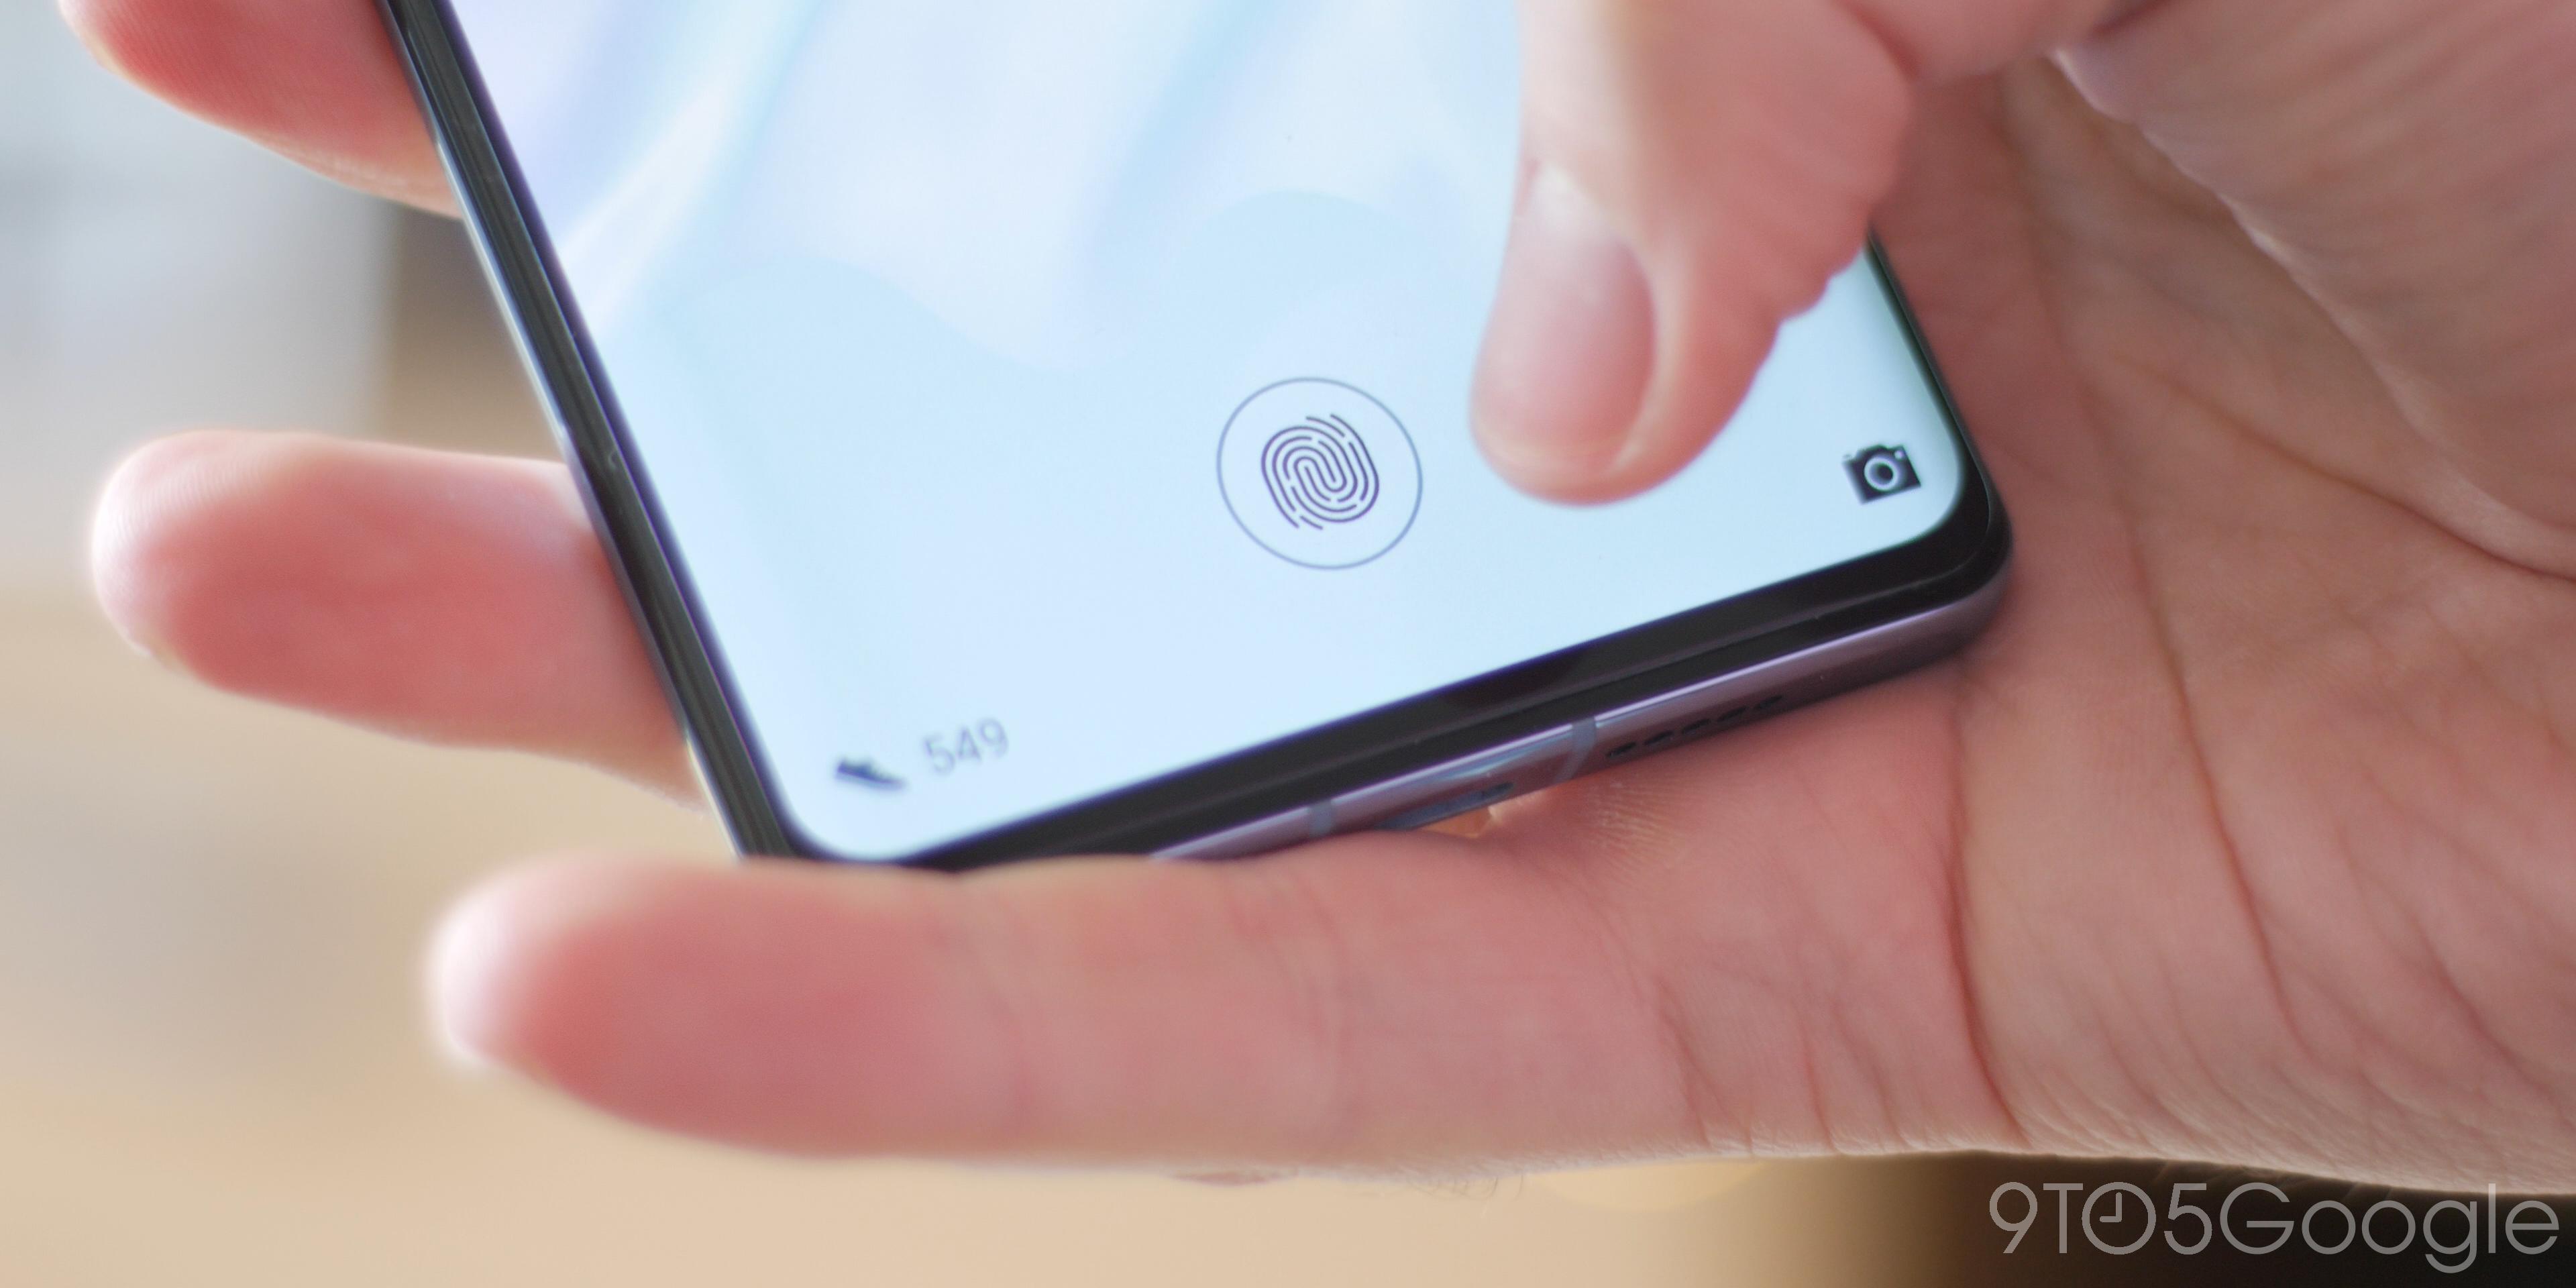 Huawei P30 Pro fingeprint reader